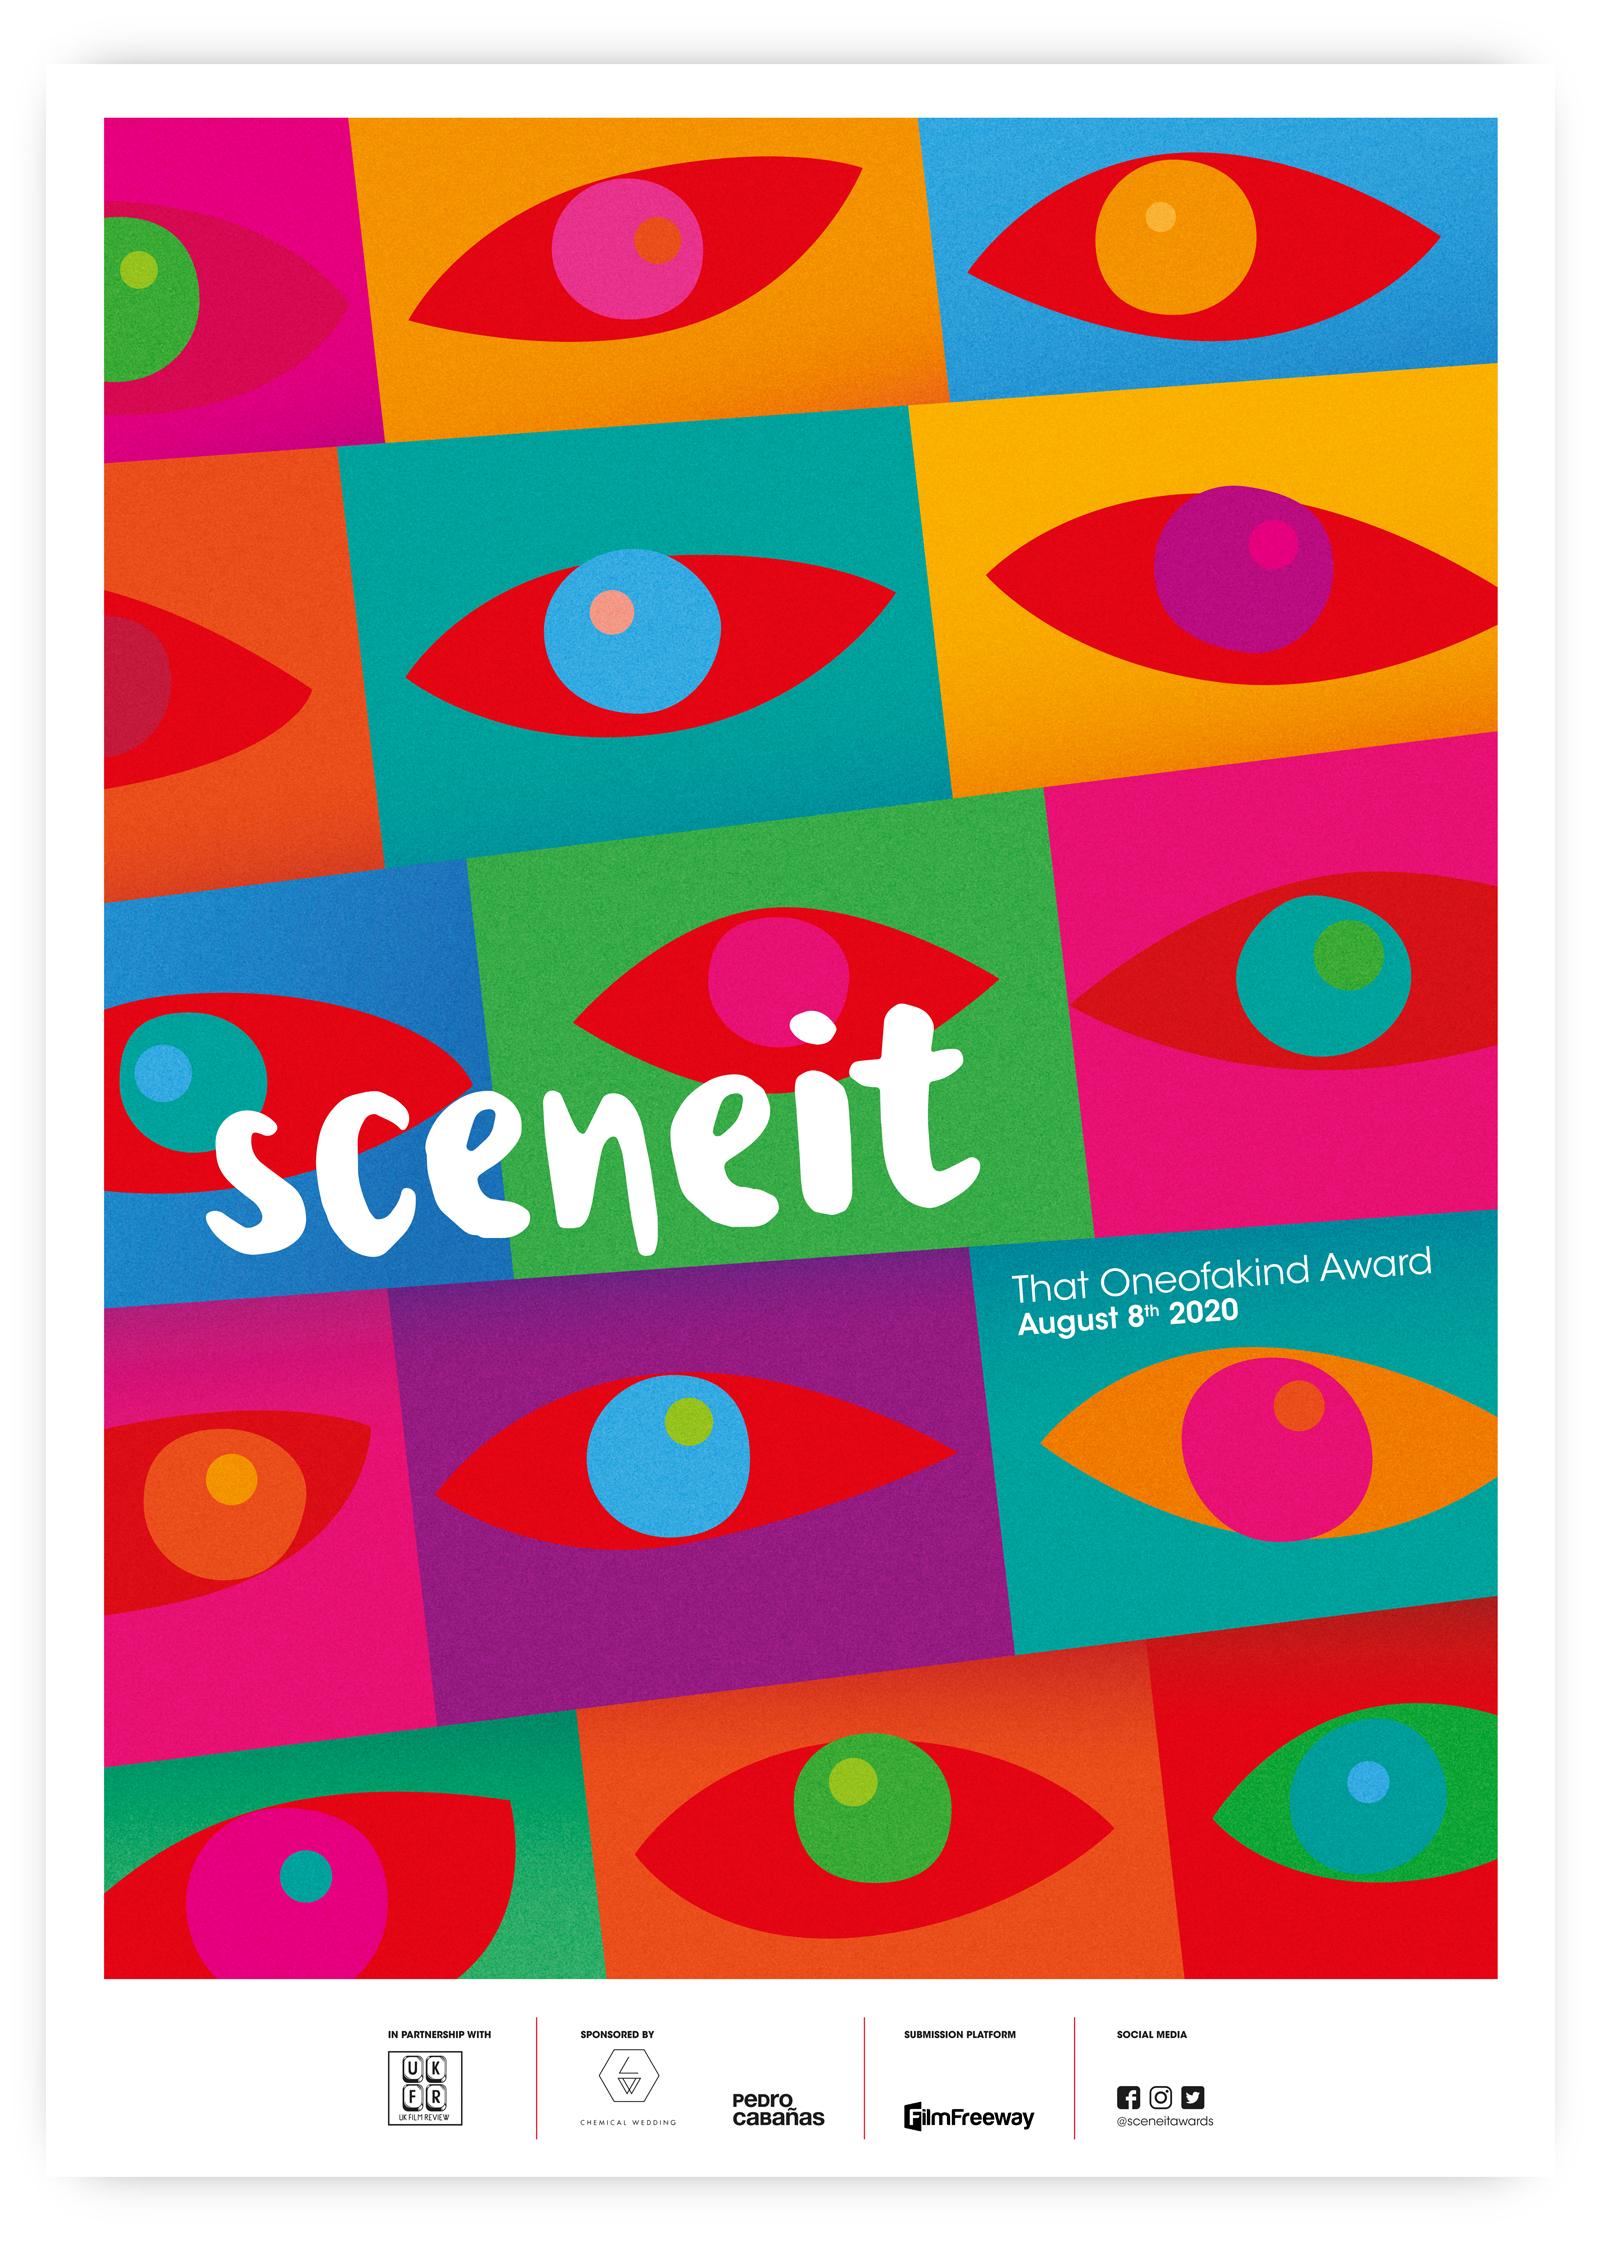 Pedro Cabañas - Design - SCENEIT